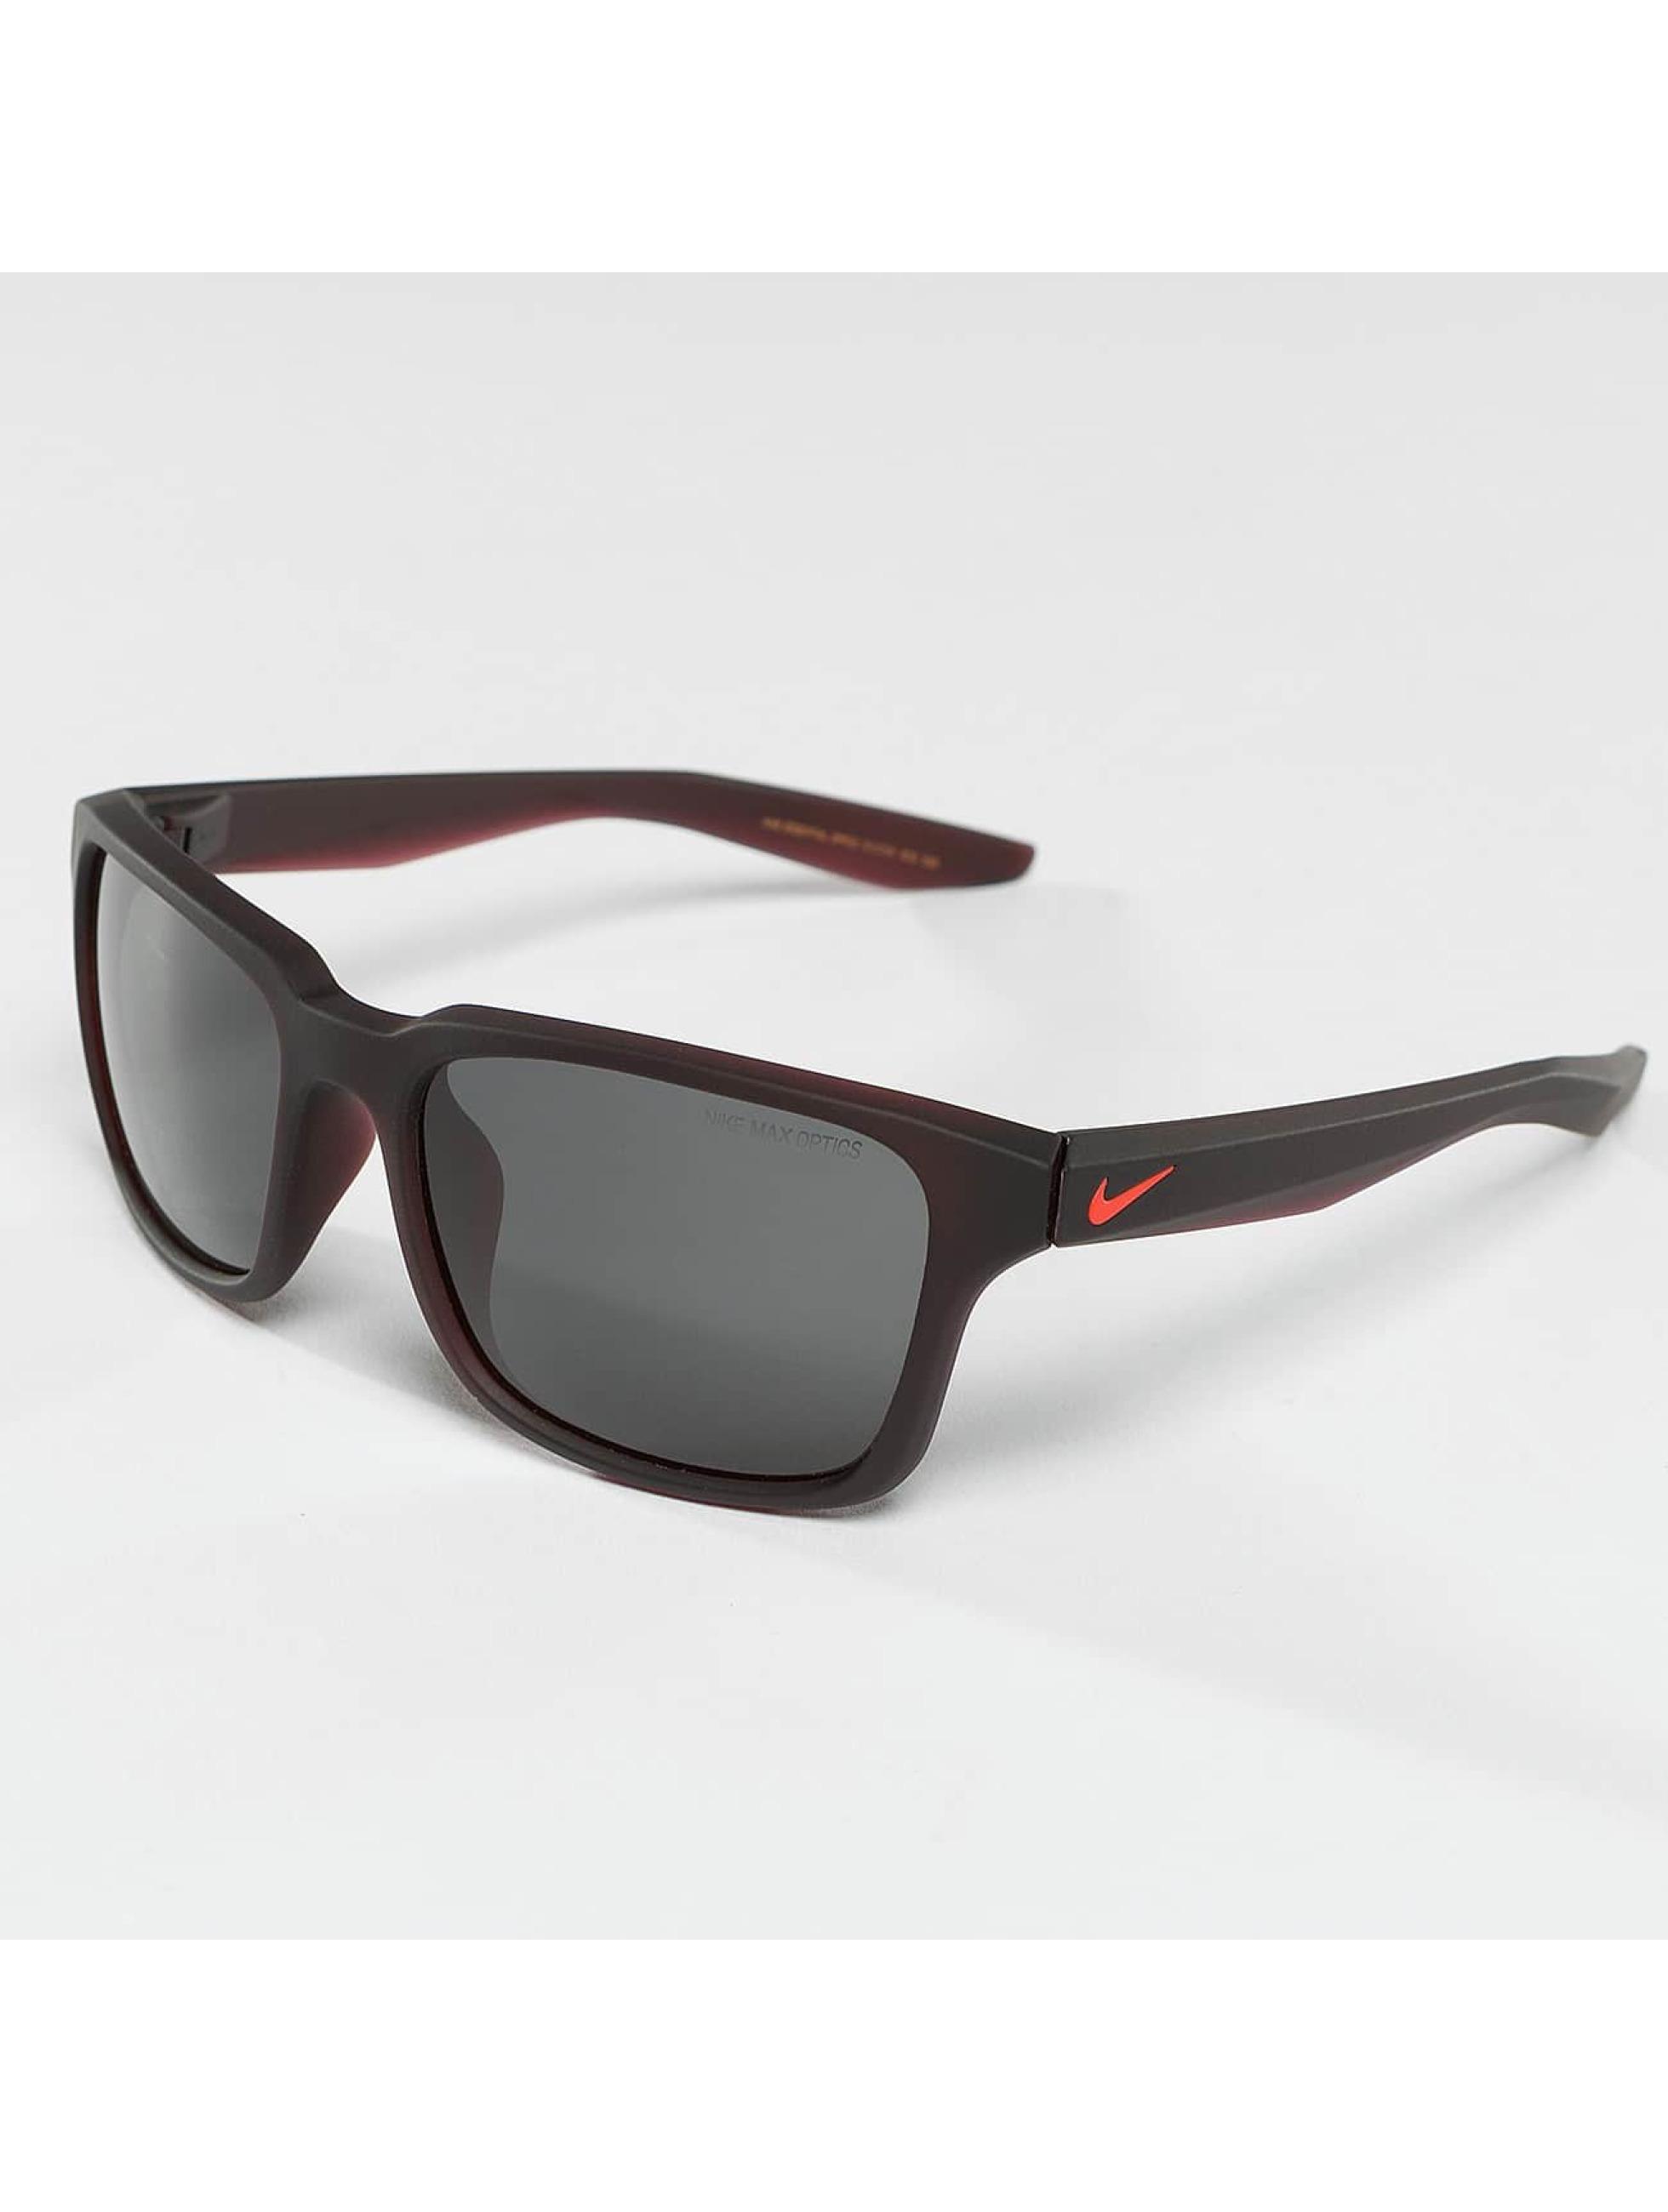 Nike Vision Lunettes de soleil Essential Spree rouge